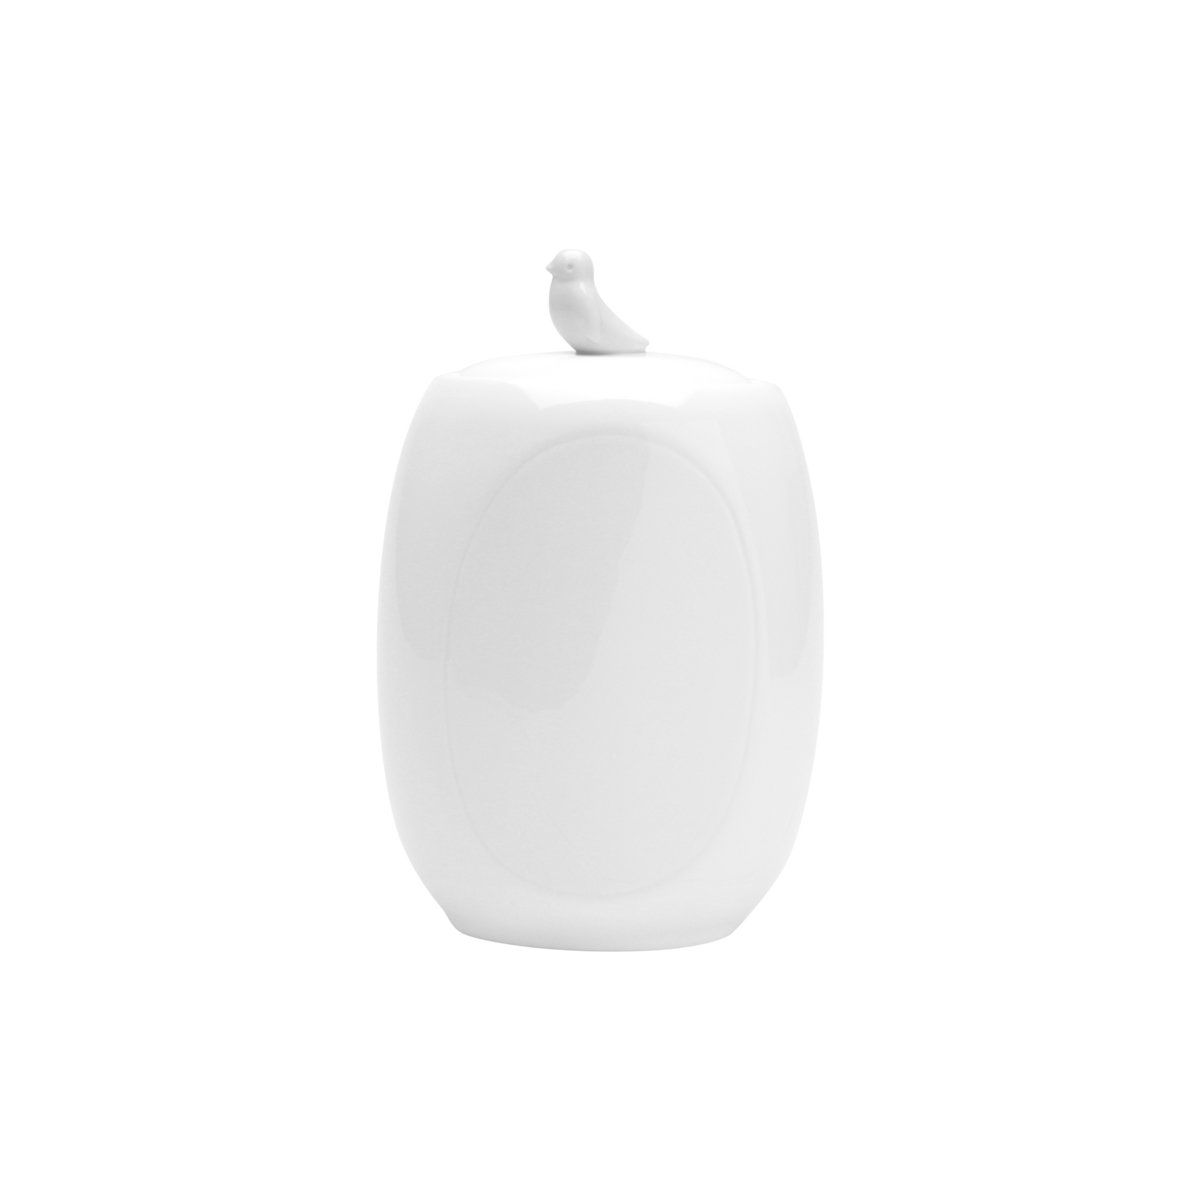 Pote 17 cm de porcelana branca com tampa Birds Wolff - 17307